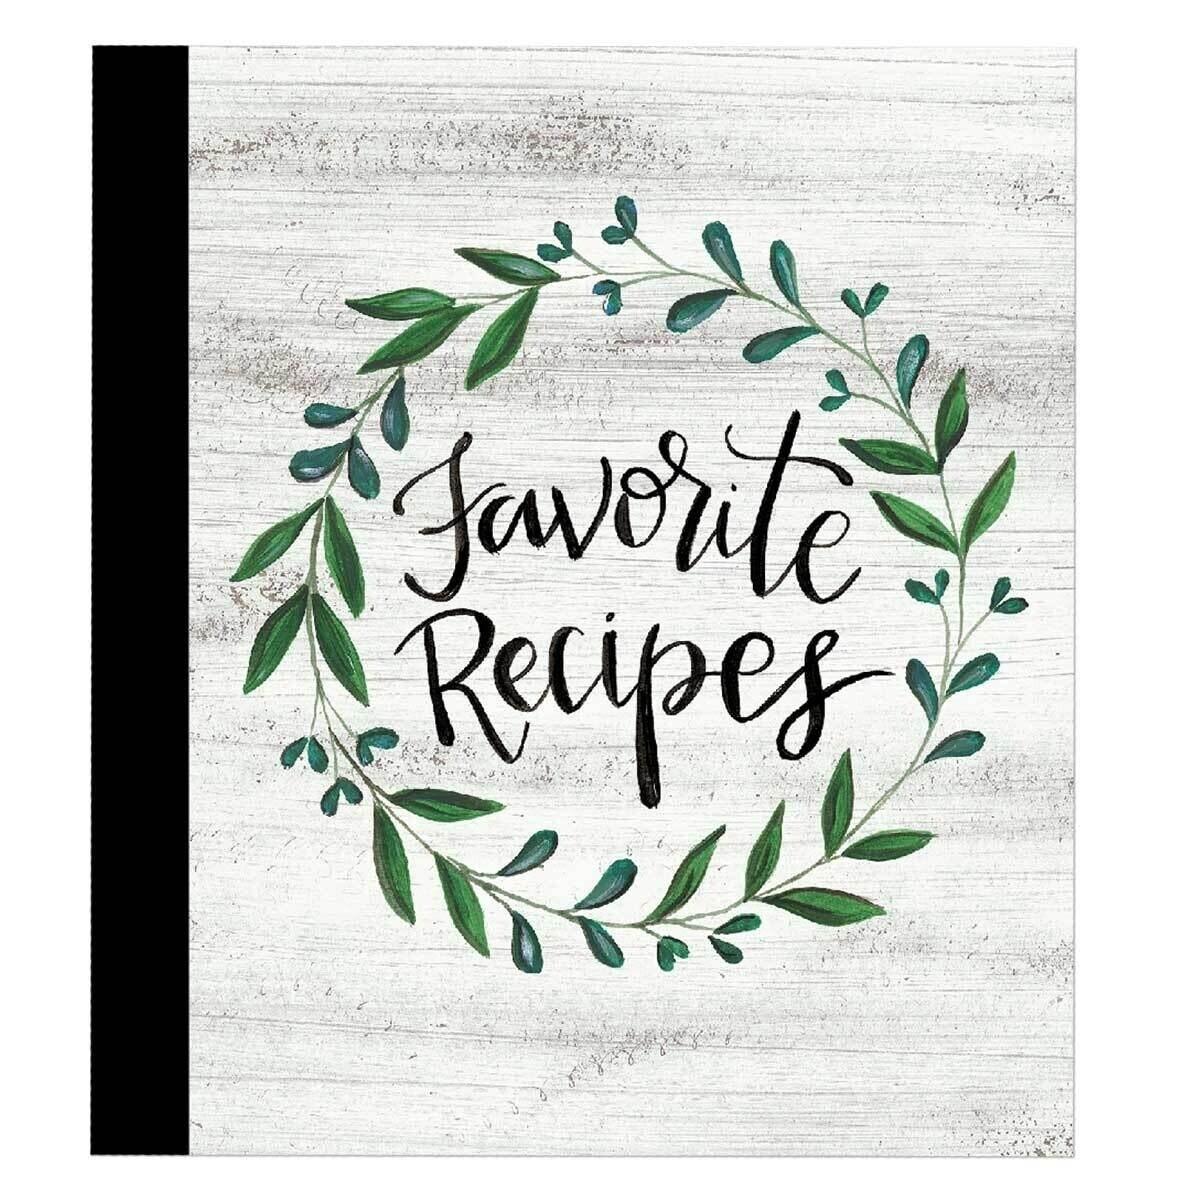 Brownlow Recipe Binder - Vintage Kitchen